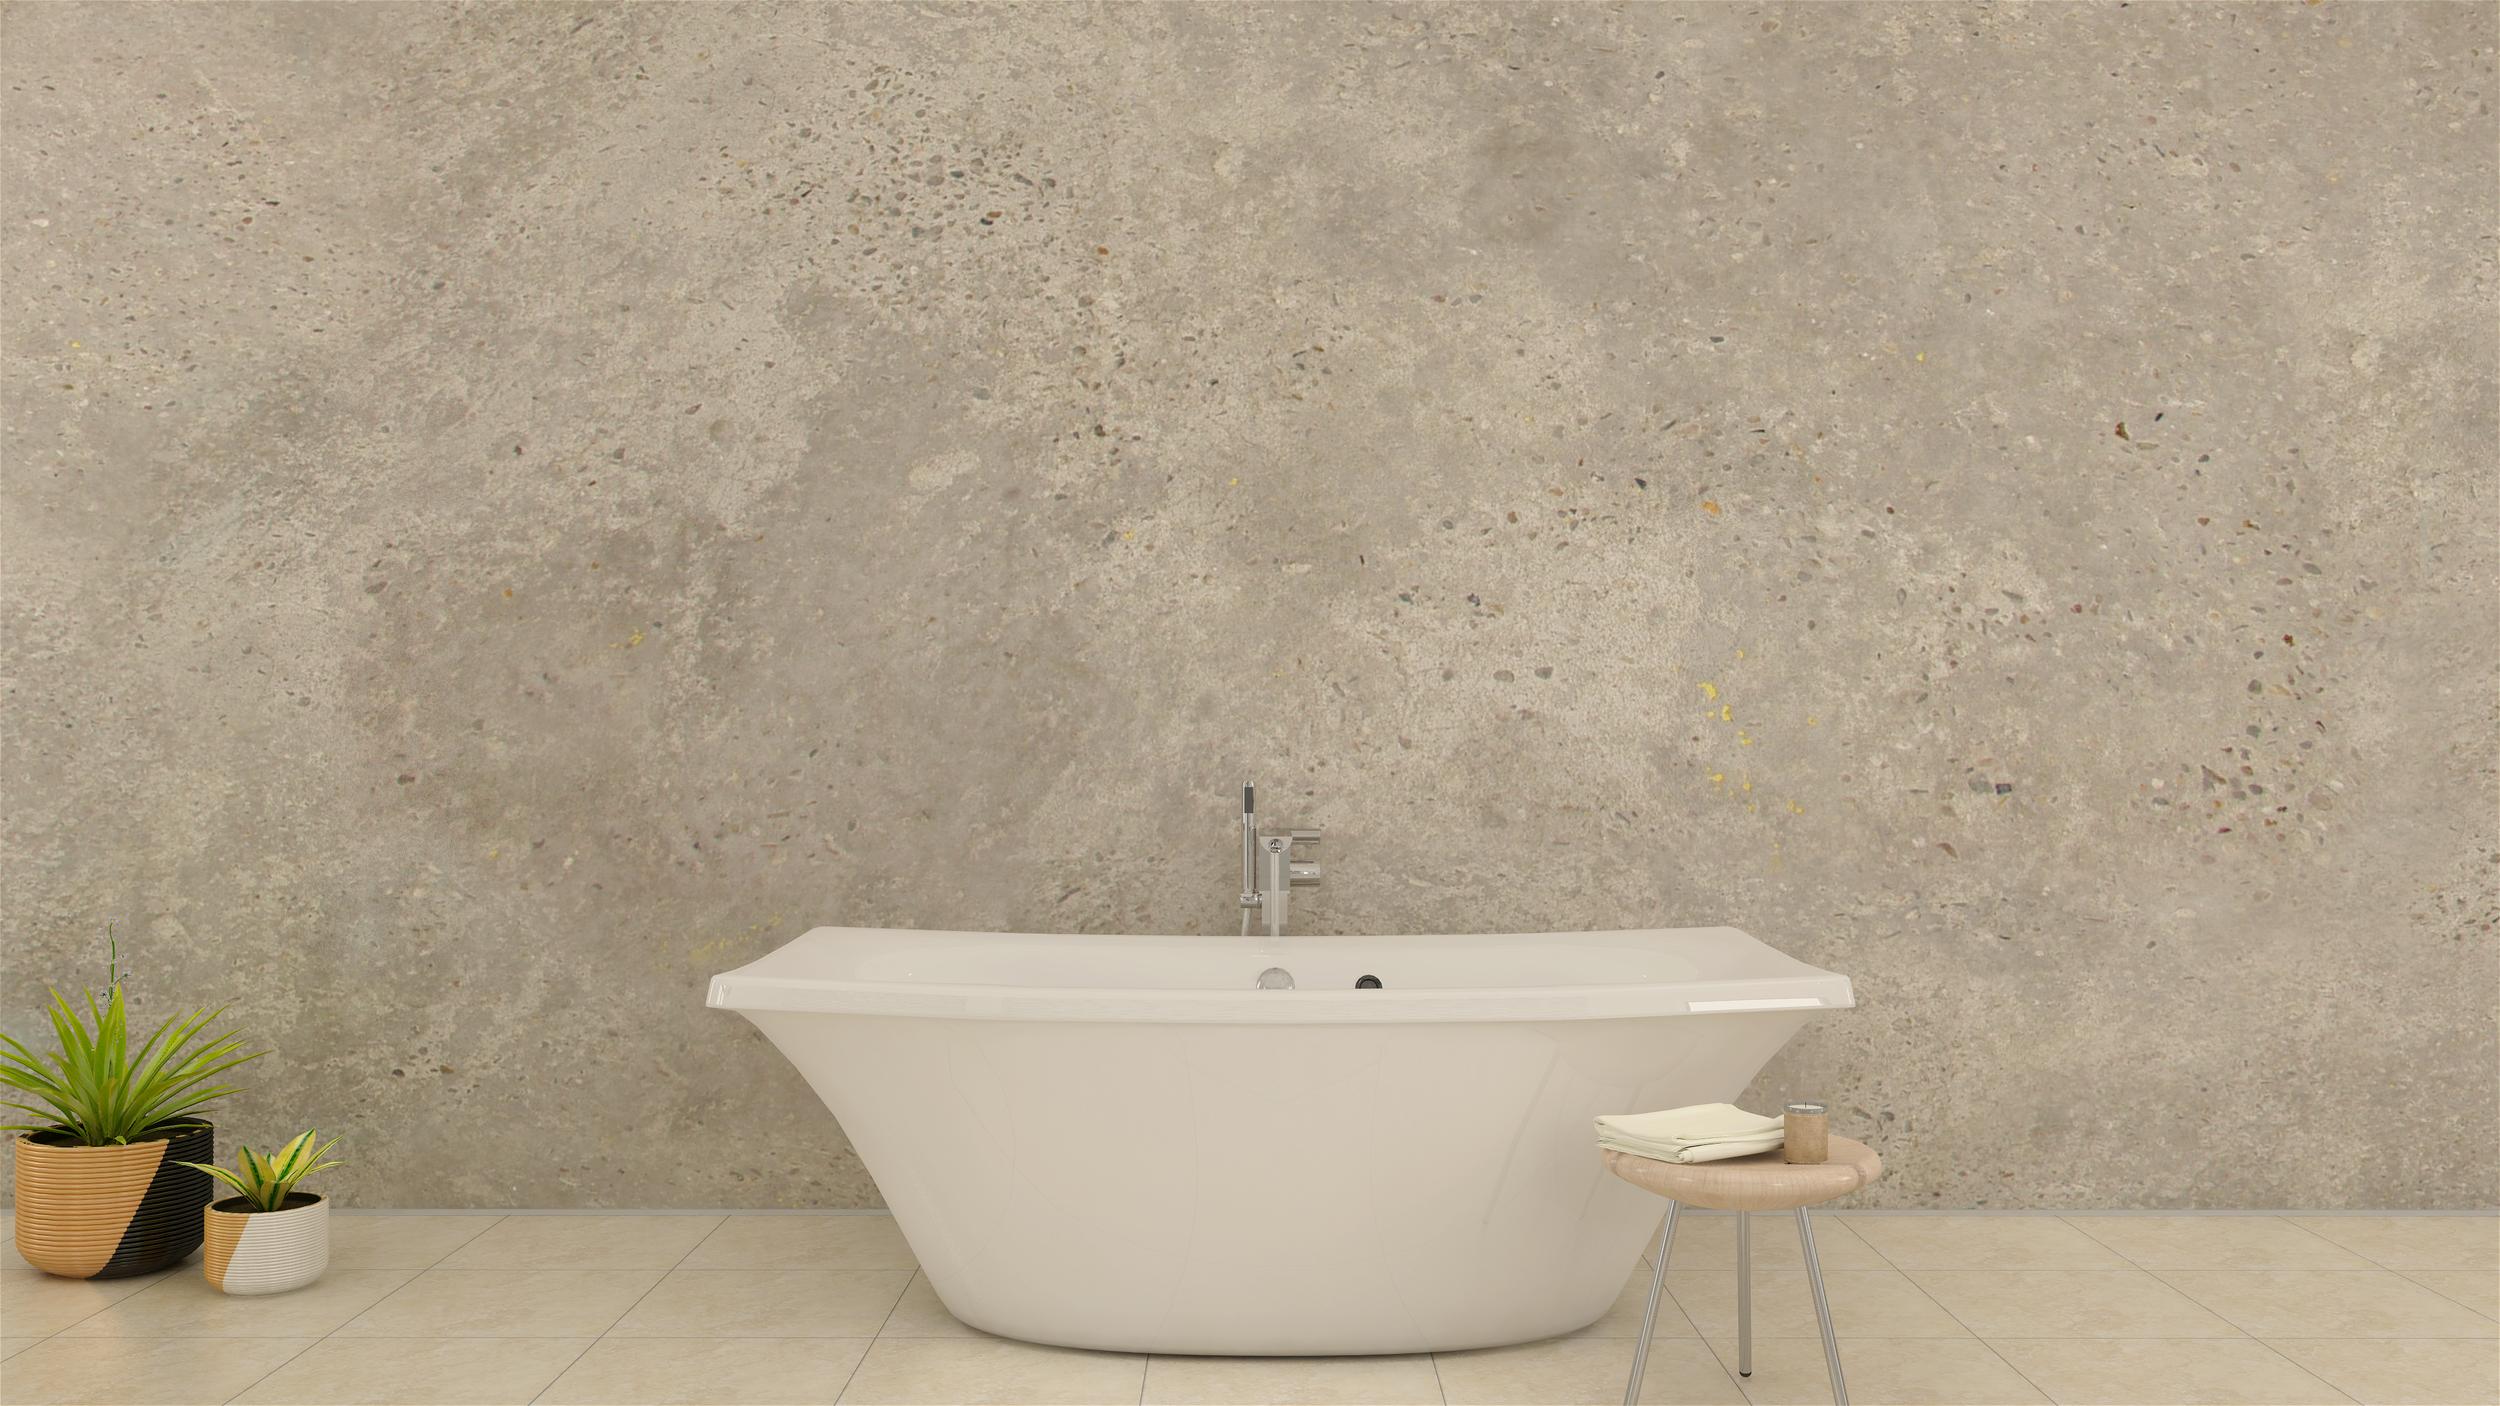 Bathroom Design Service -